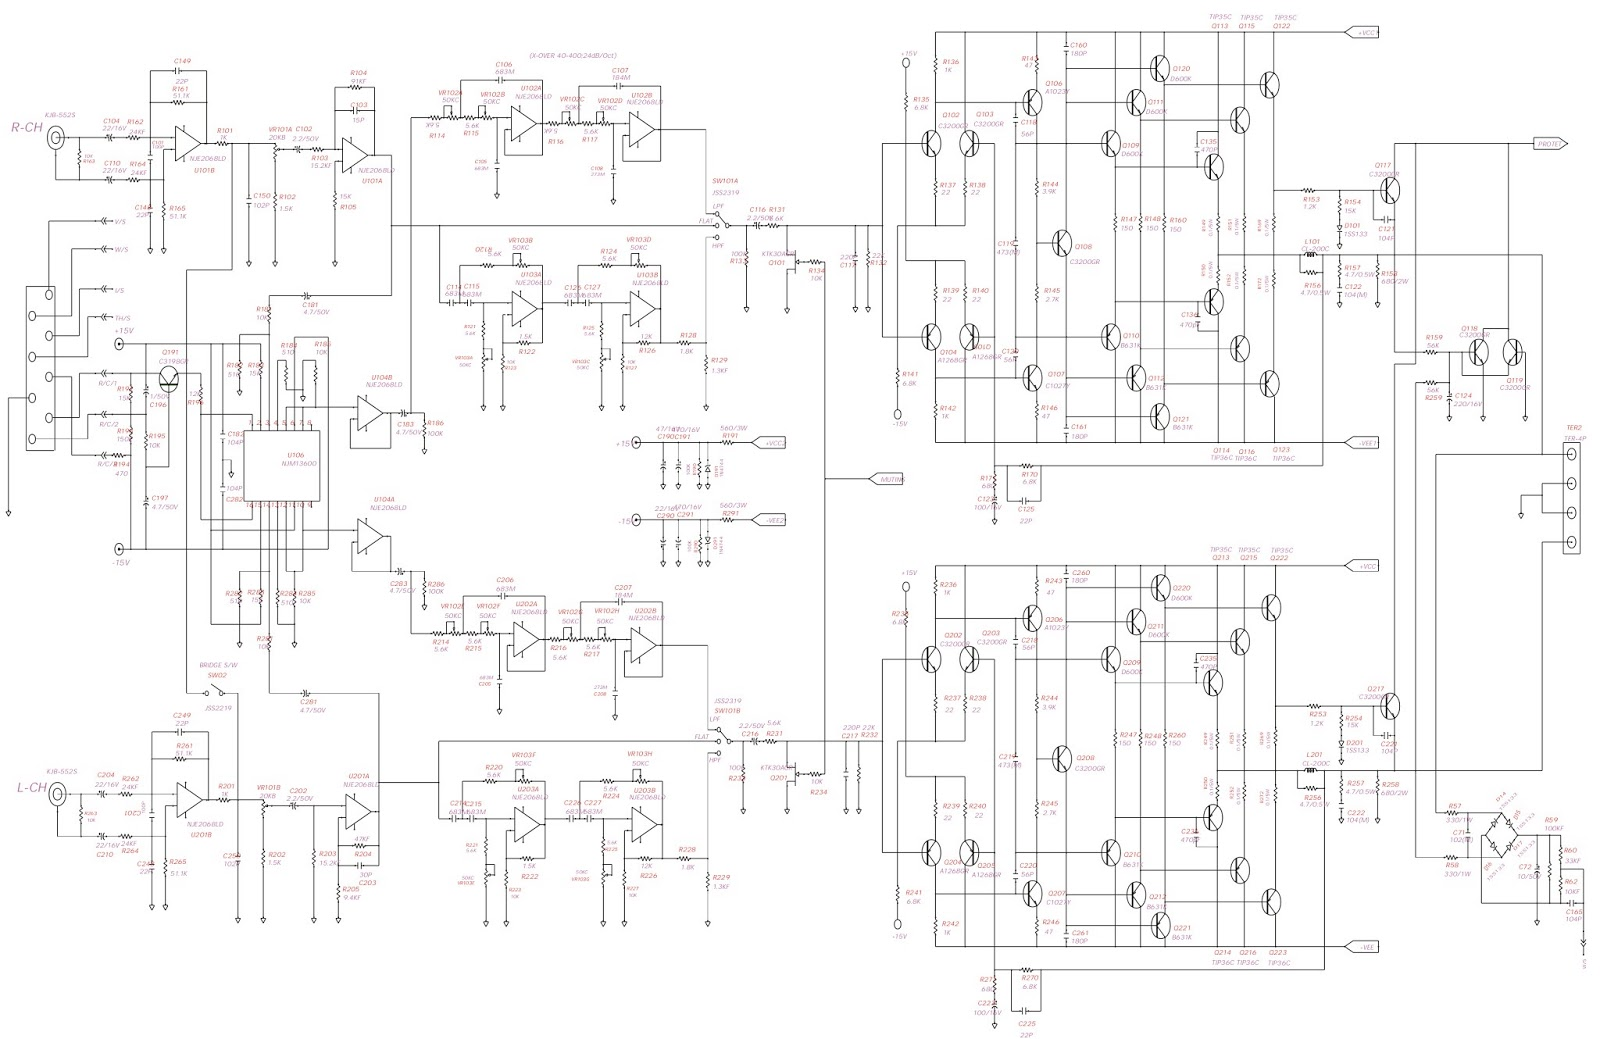 Bmw e36 power window switch wiring diagram wiring diagram and